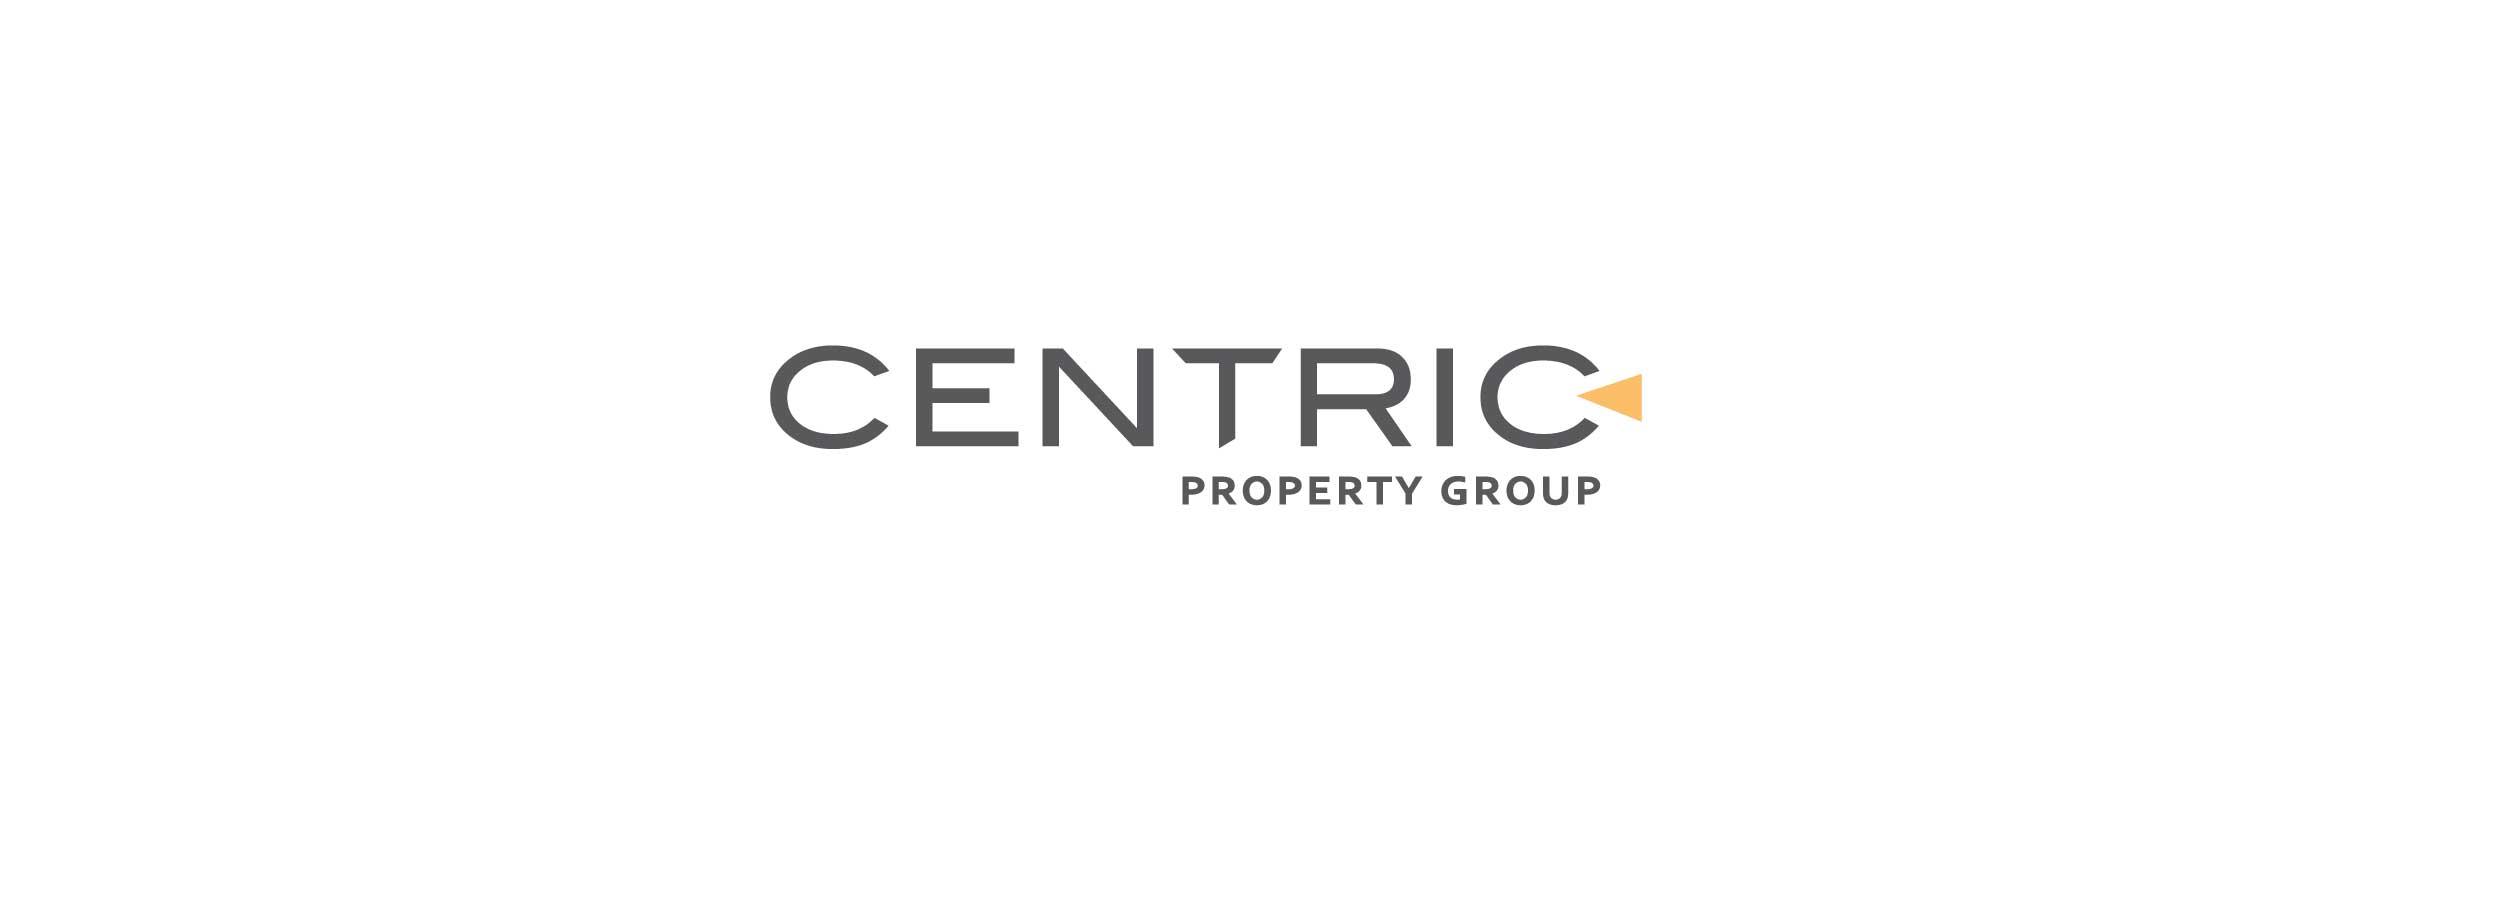 Centric logo.jpg